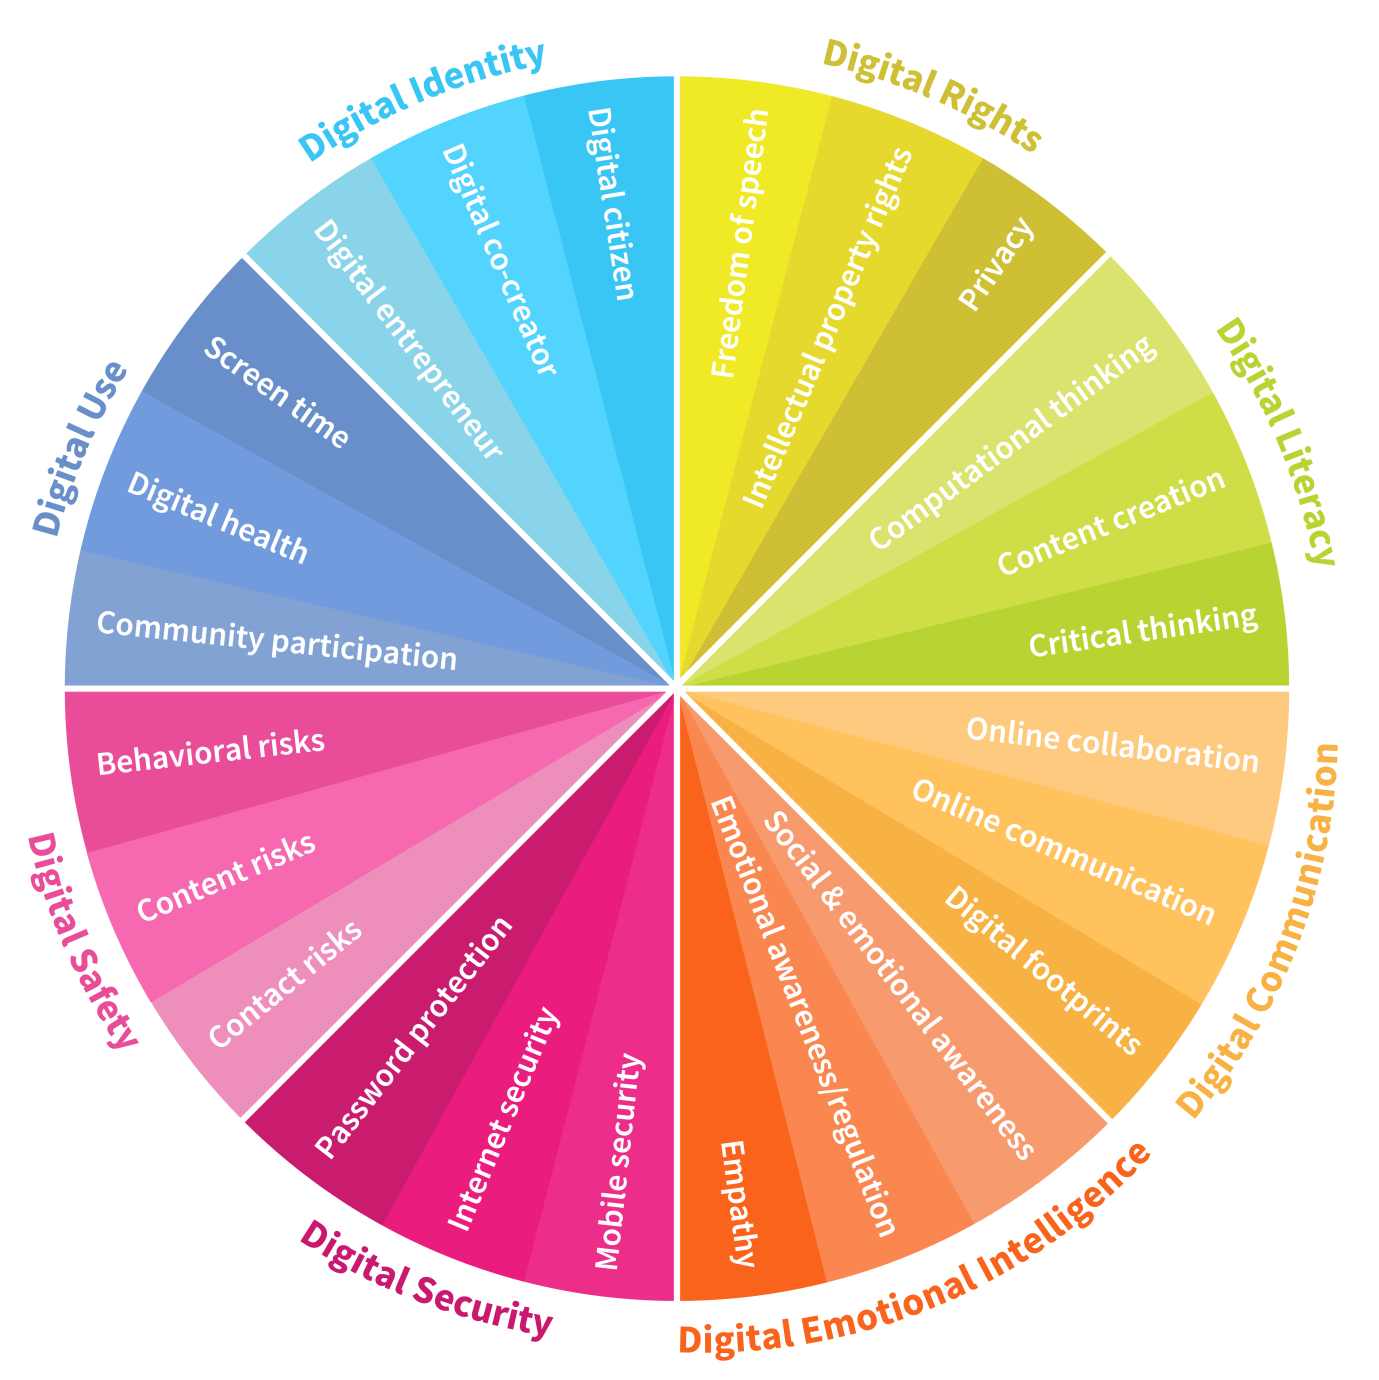 8 digital skills we must teac